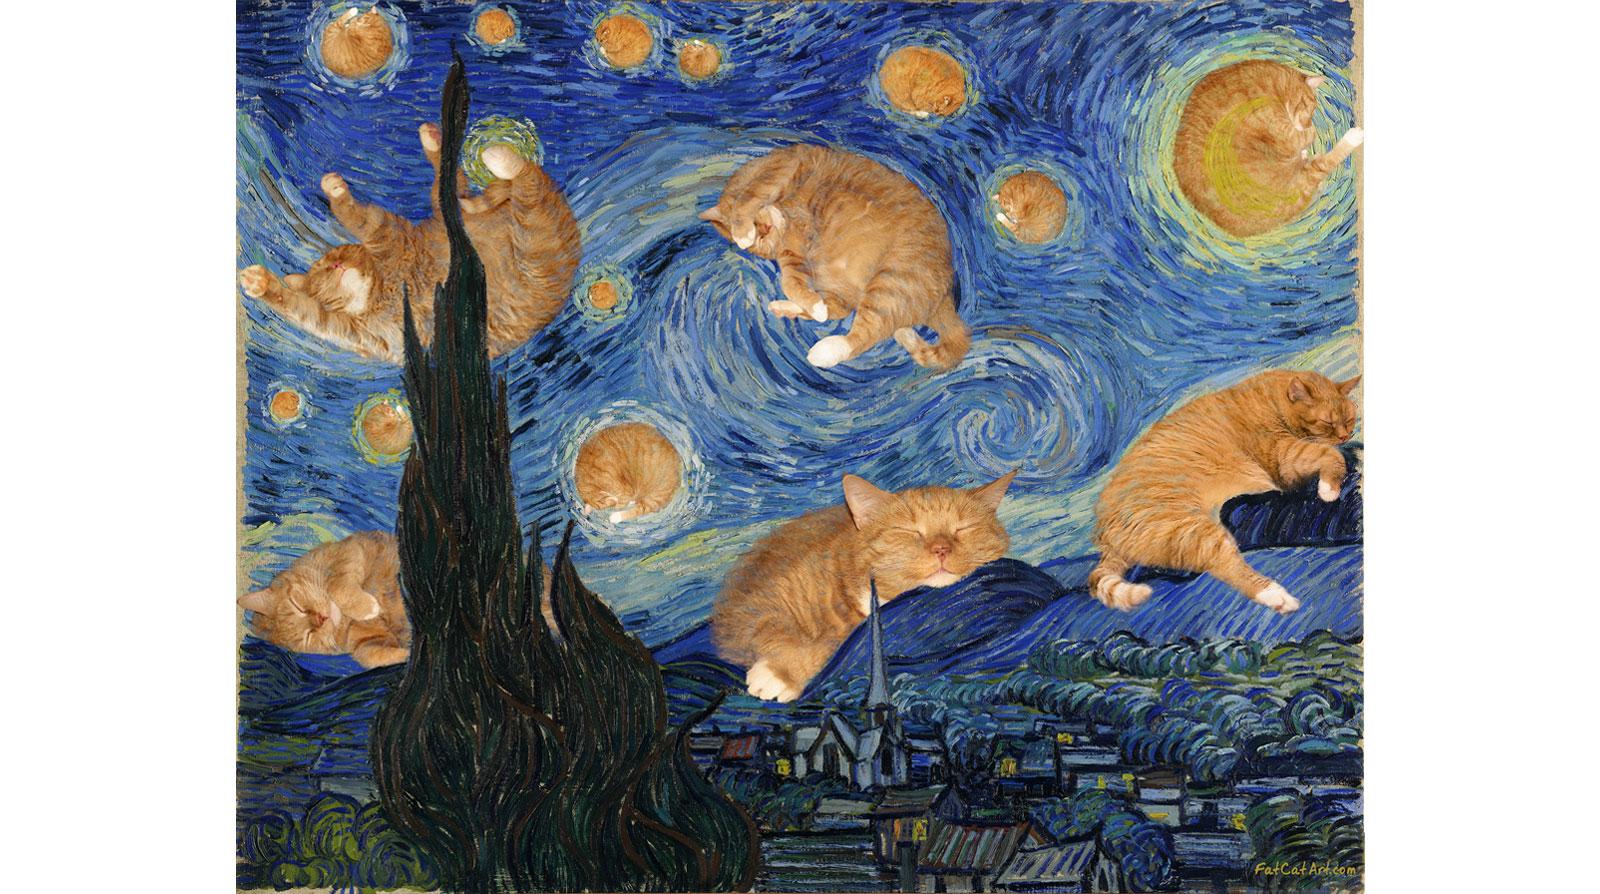 Vincent van Gogh. The Furry Starry Night